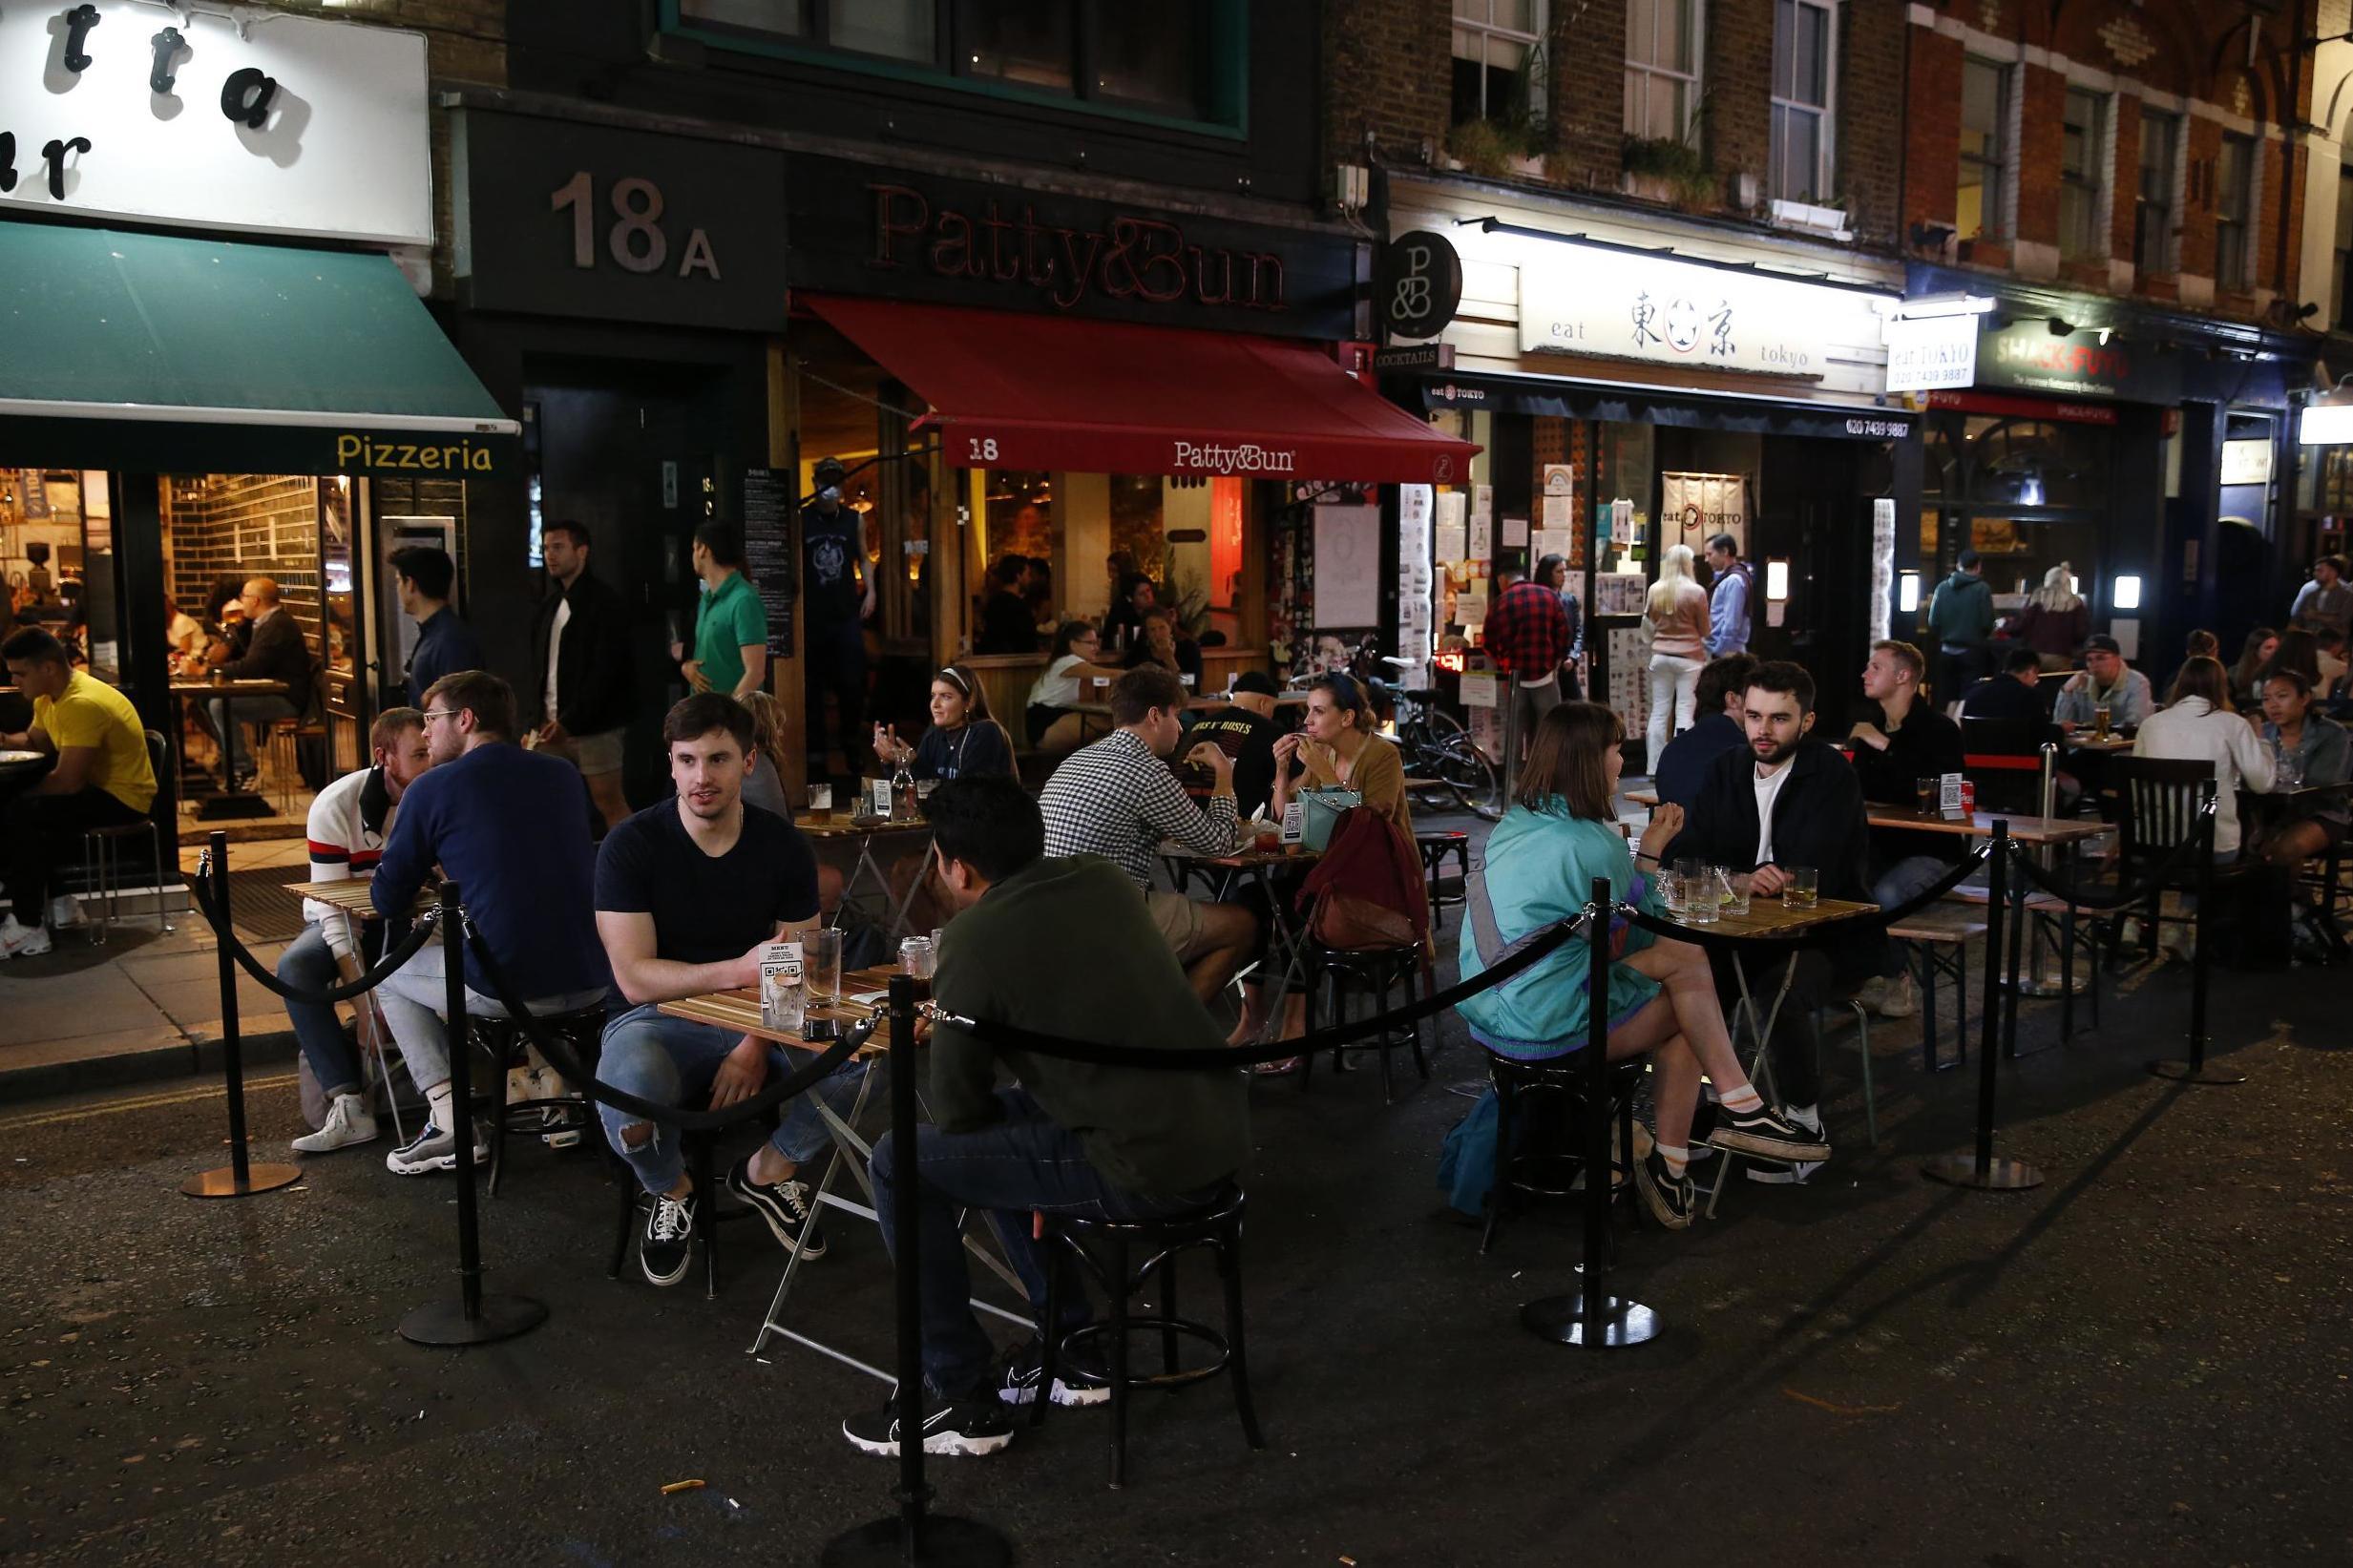 west-end-restaurants-given-outdoor-heater-go-ahead-for-alfresco-winter